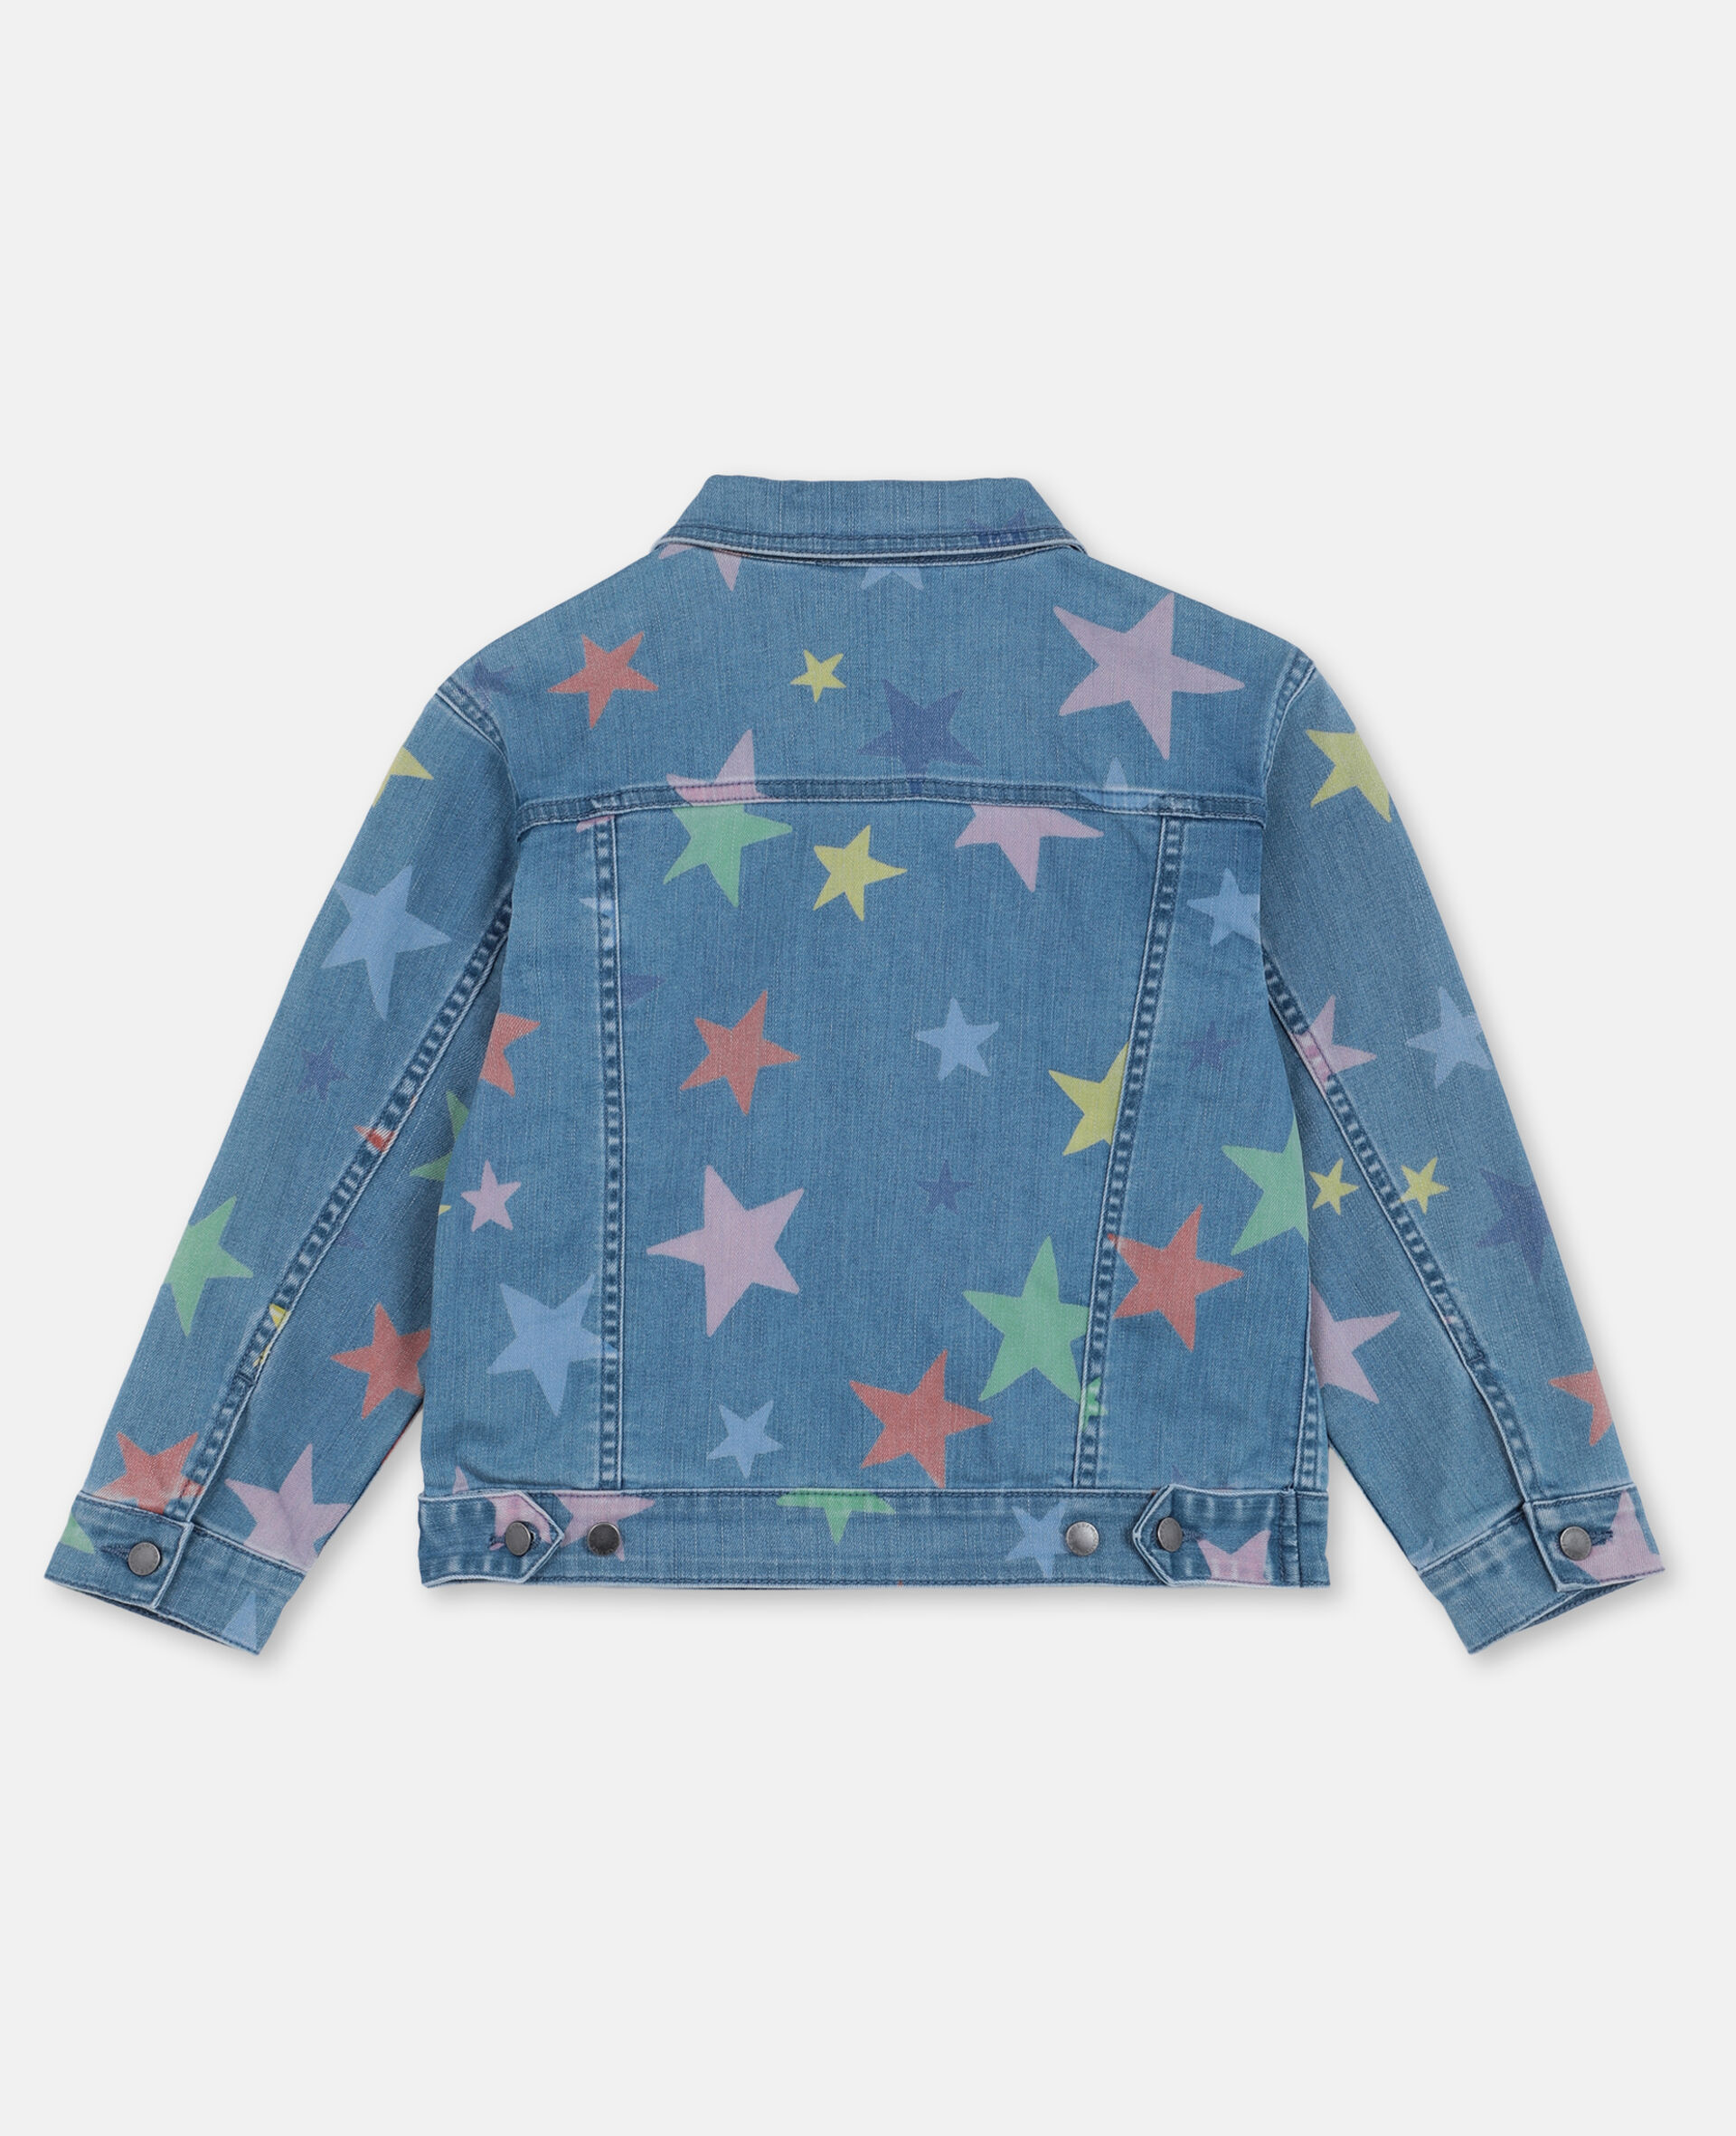 Multicolour Stars Denim Jacket -Multicolour-large image number 3